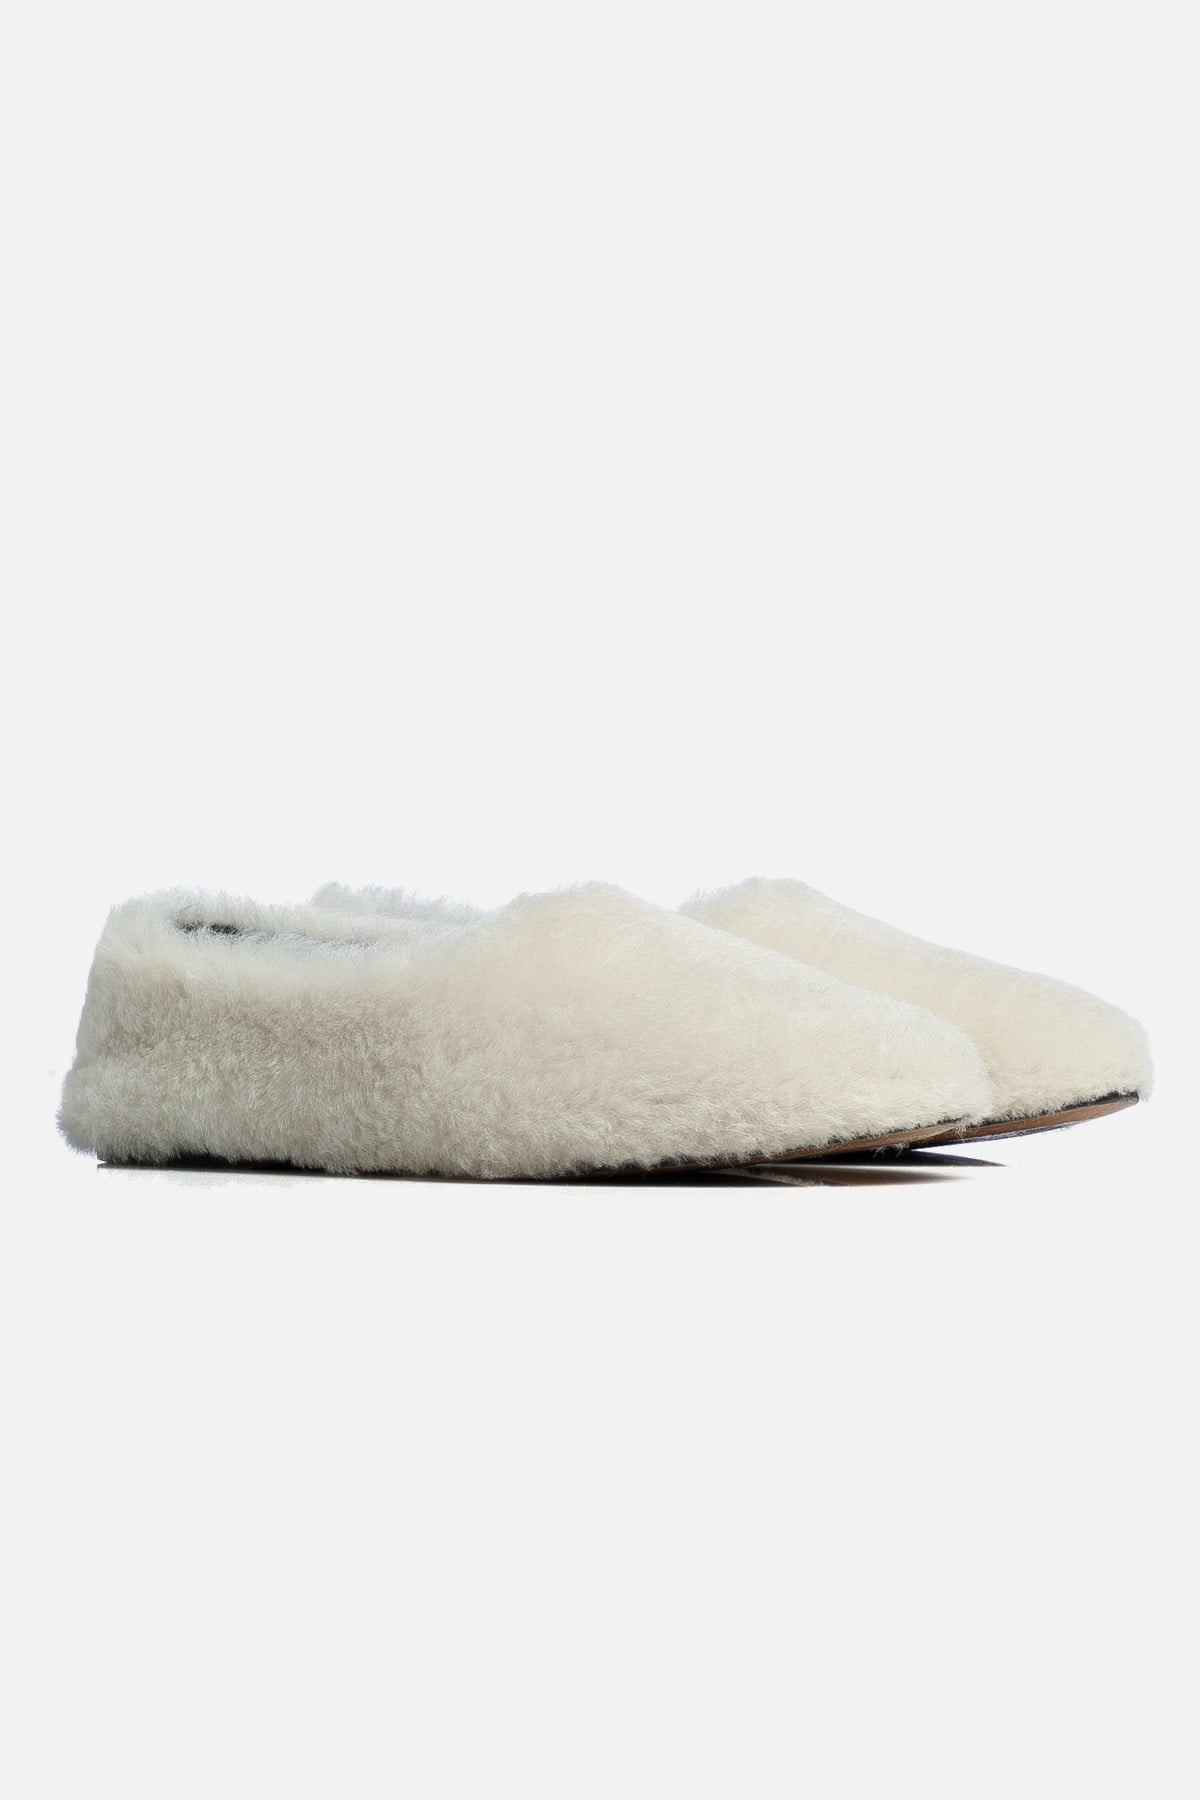 Cosy Slipper Shearling Flats